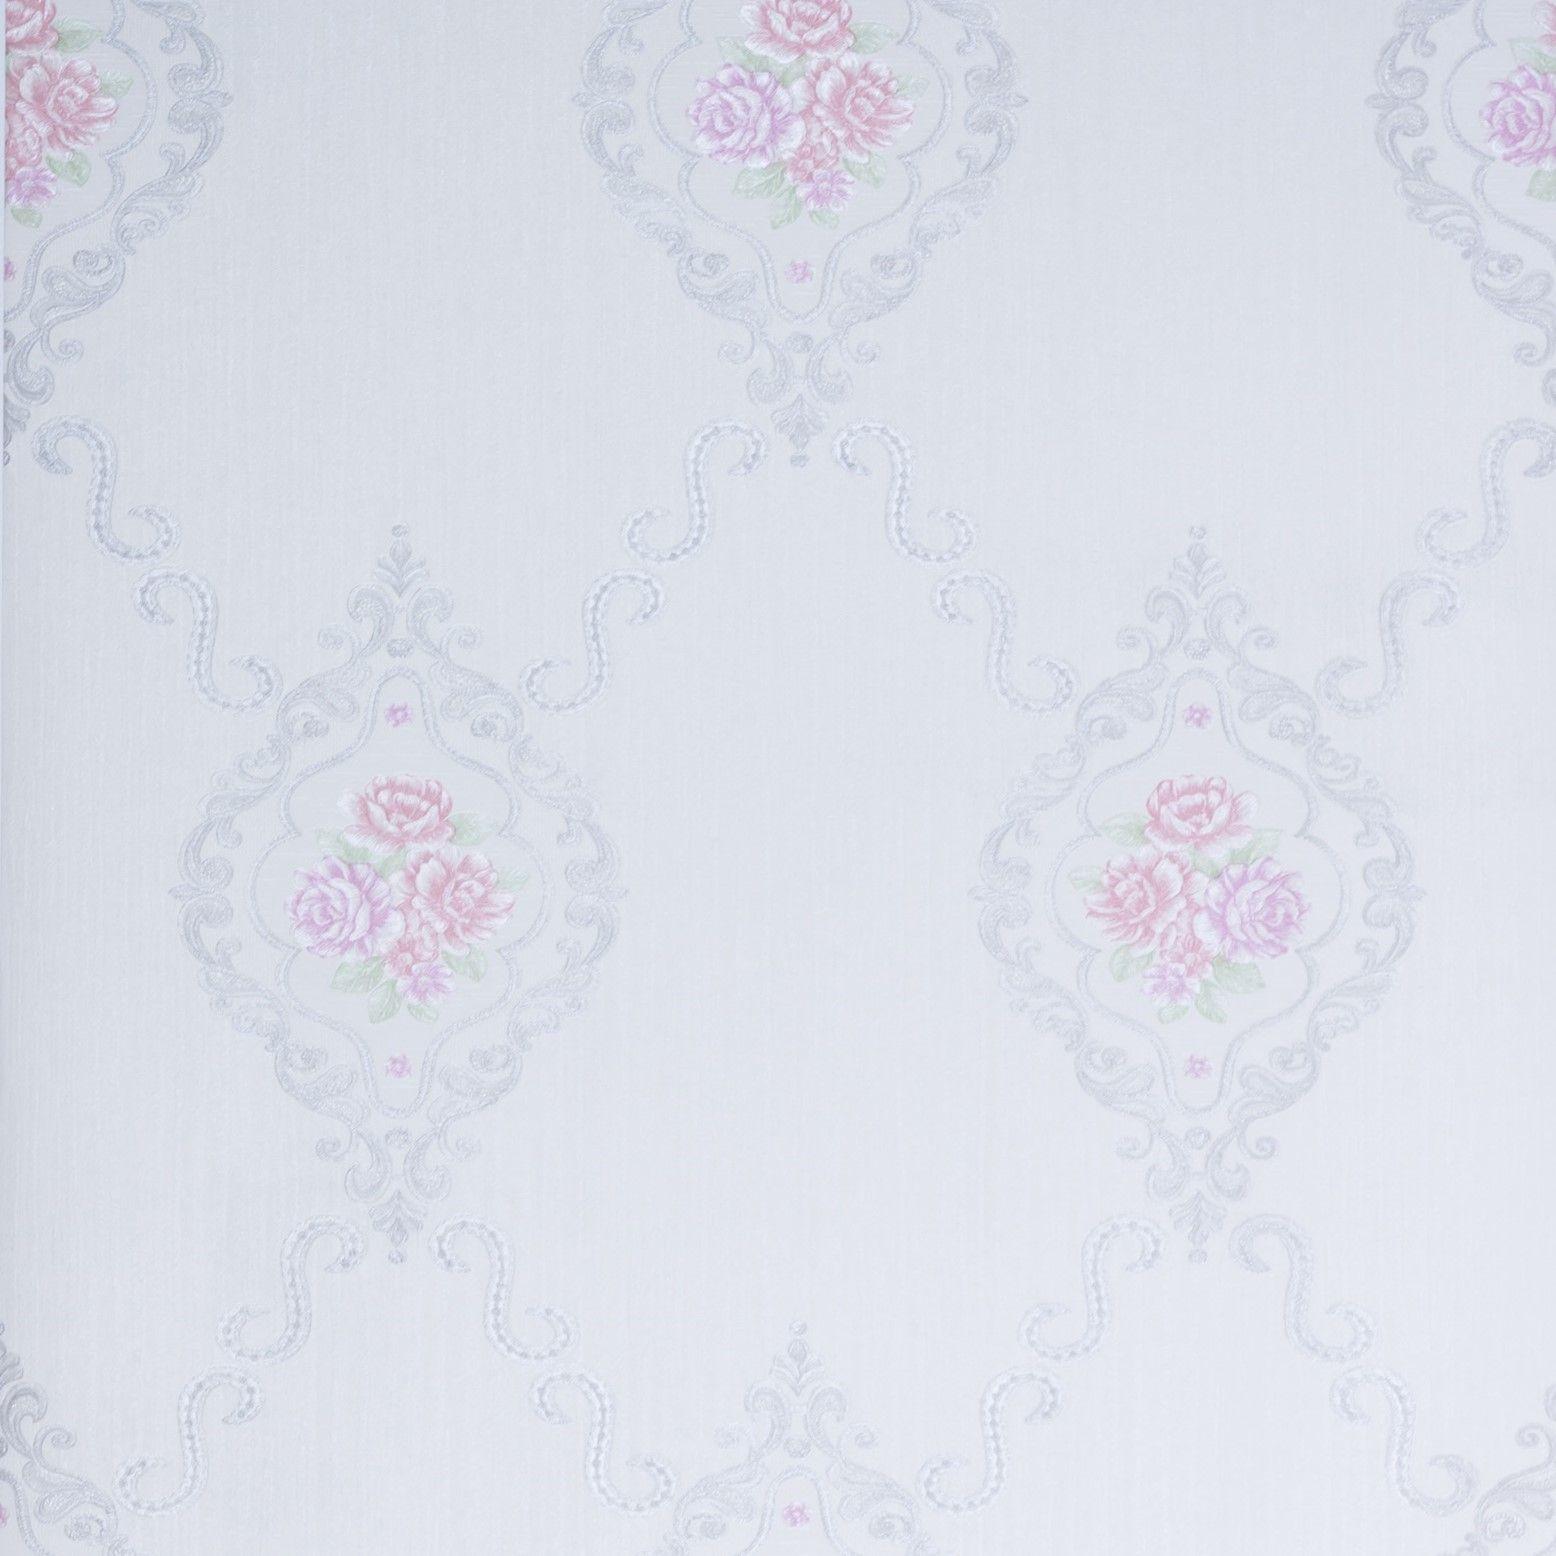 Papel de Parede Paris Decor Vinílico Coleção Chamonix Damask Floral Off White, Cinza, Rosa